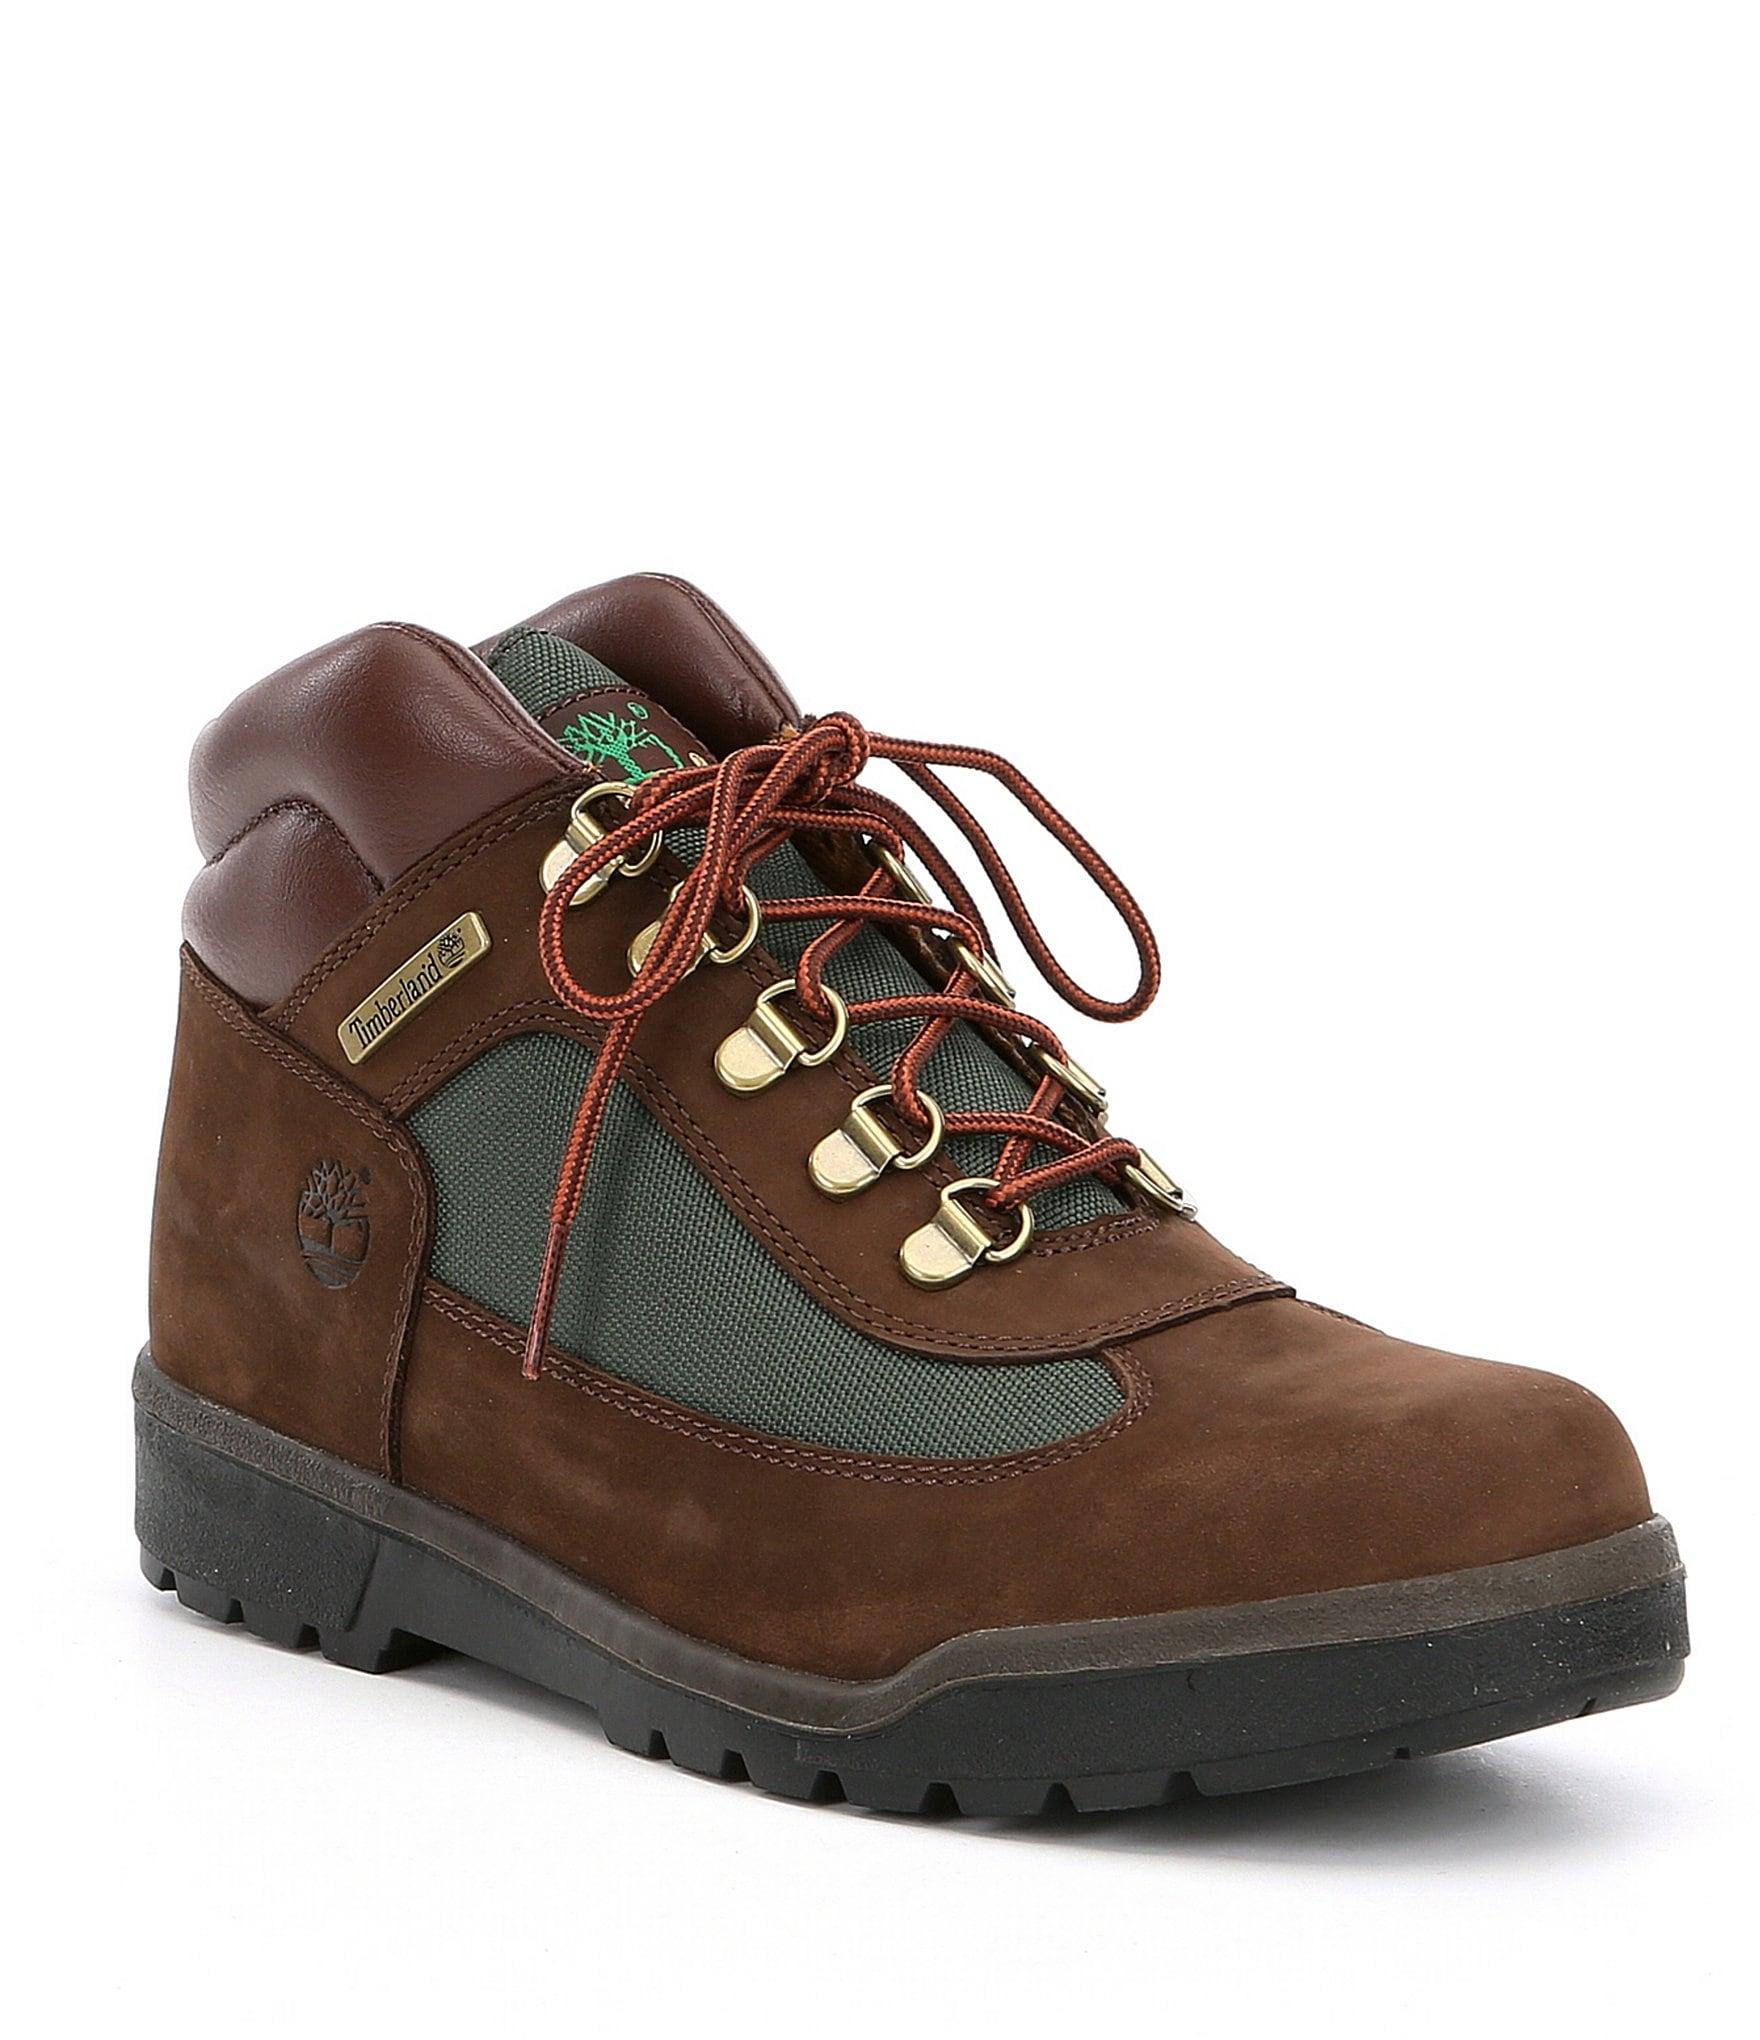 Timberland Boys Field Boots | Dillards